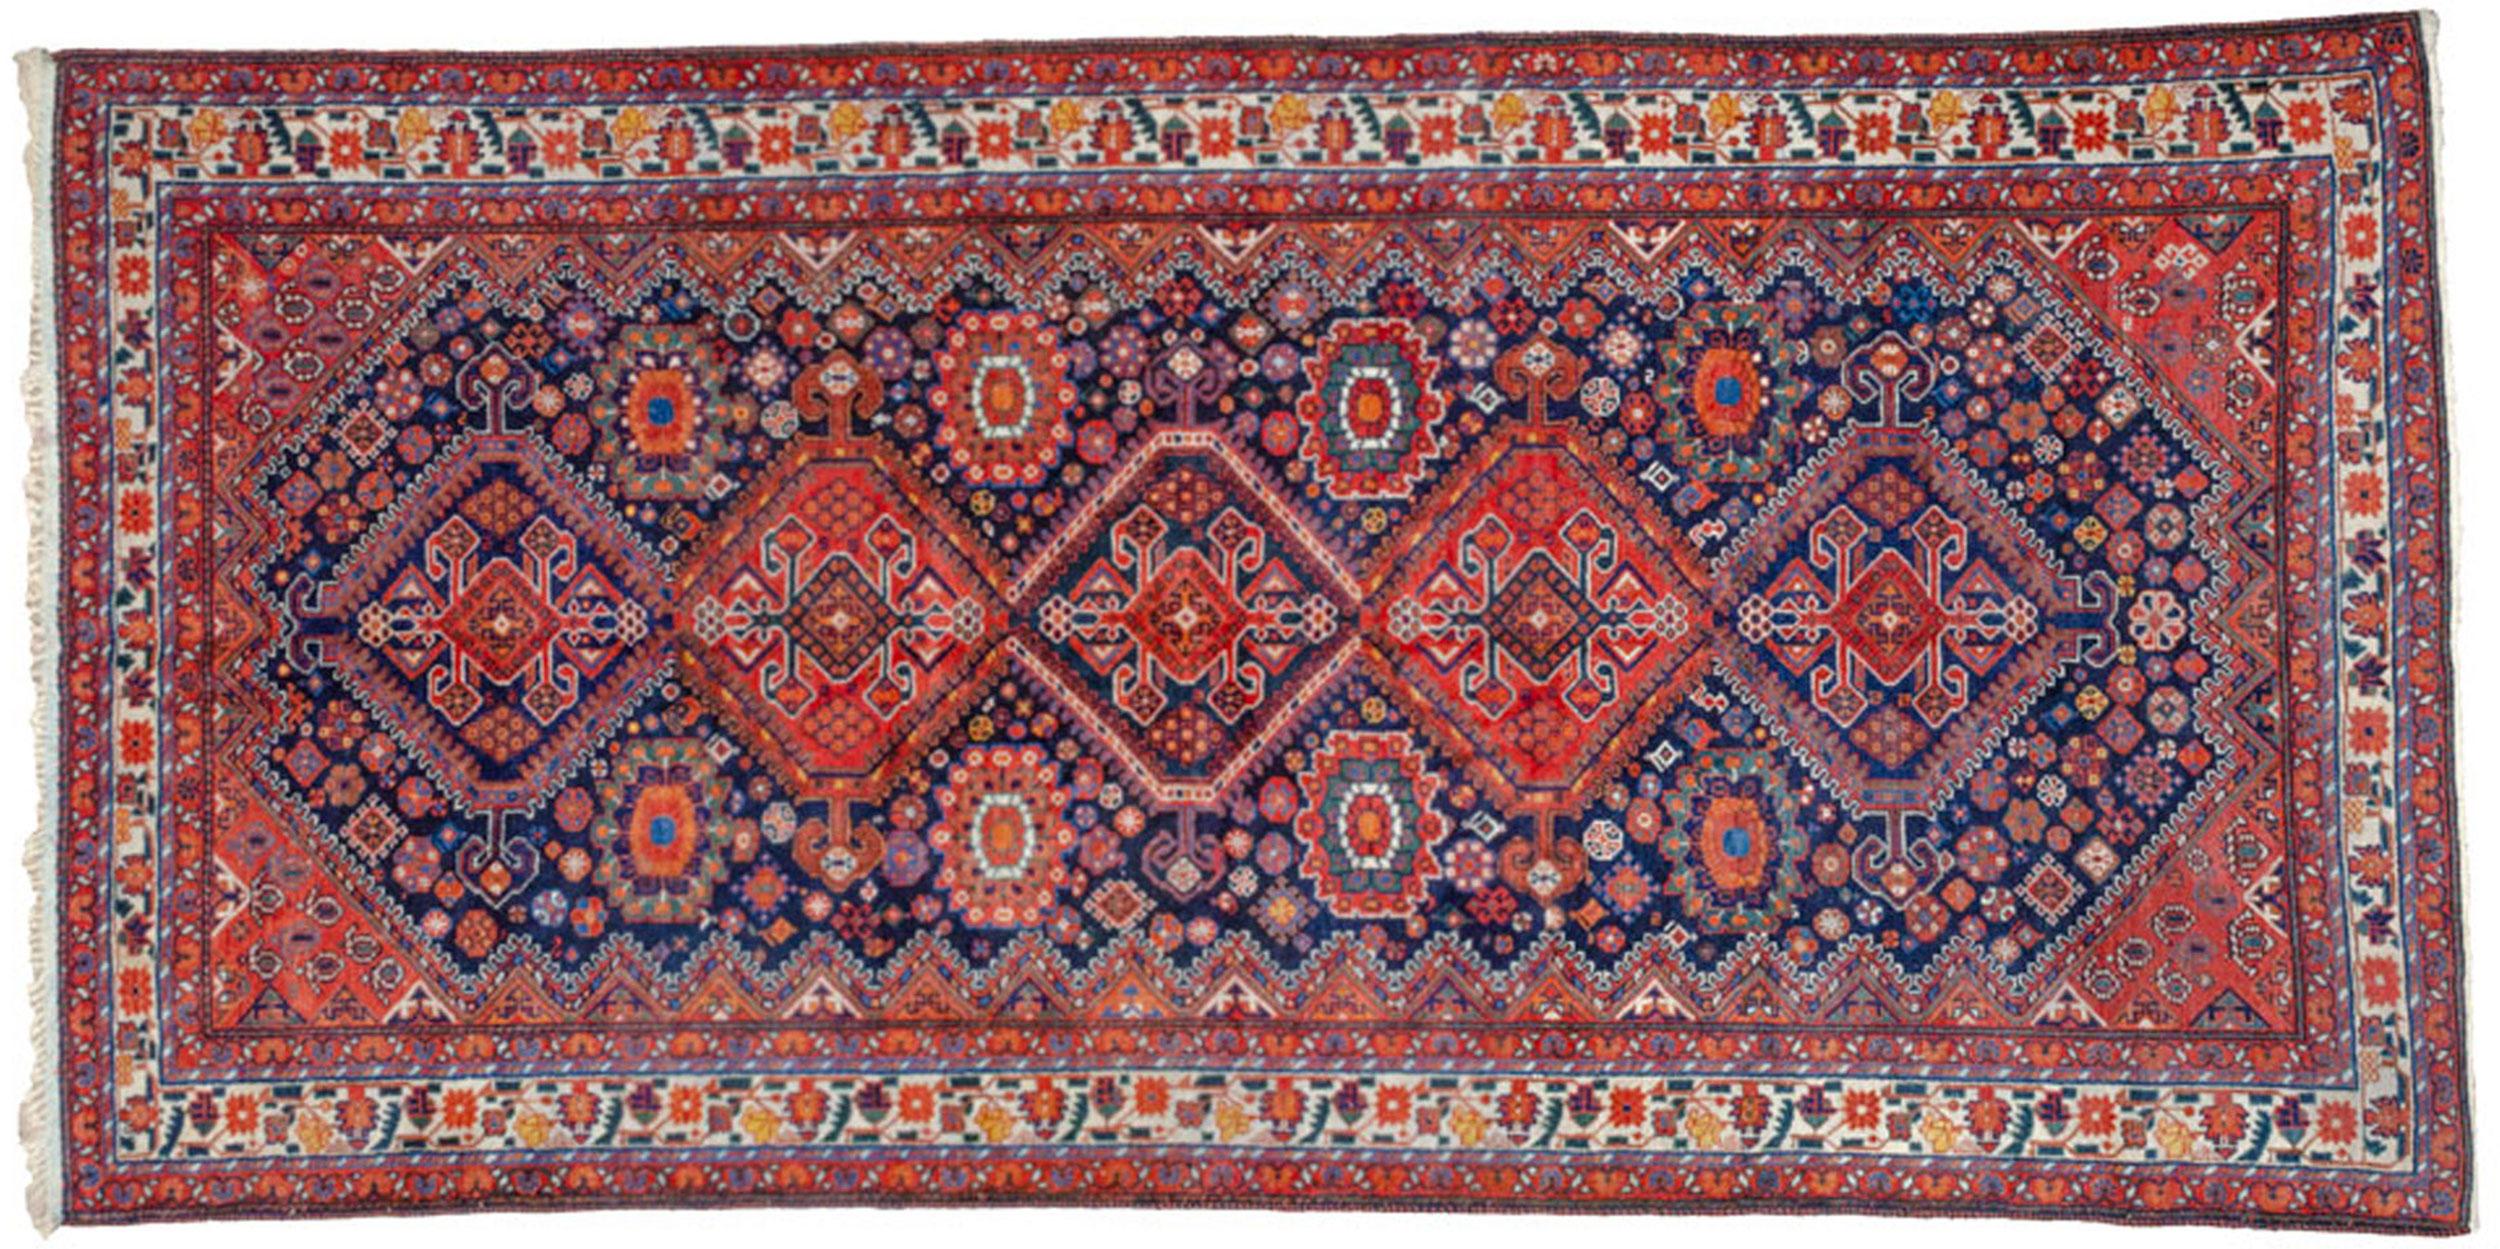 Antique Heinegoon Carpet 324x161cm